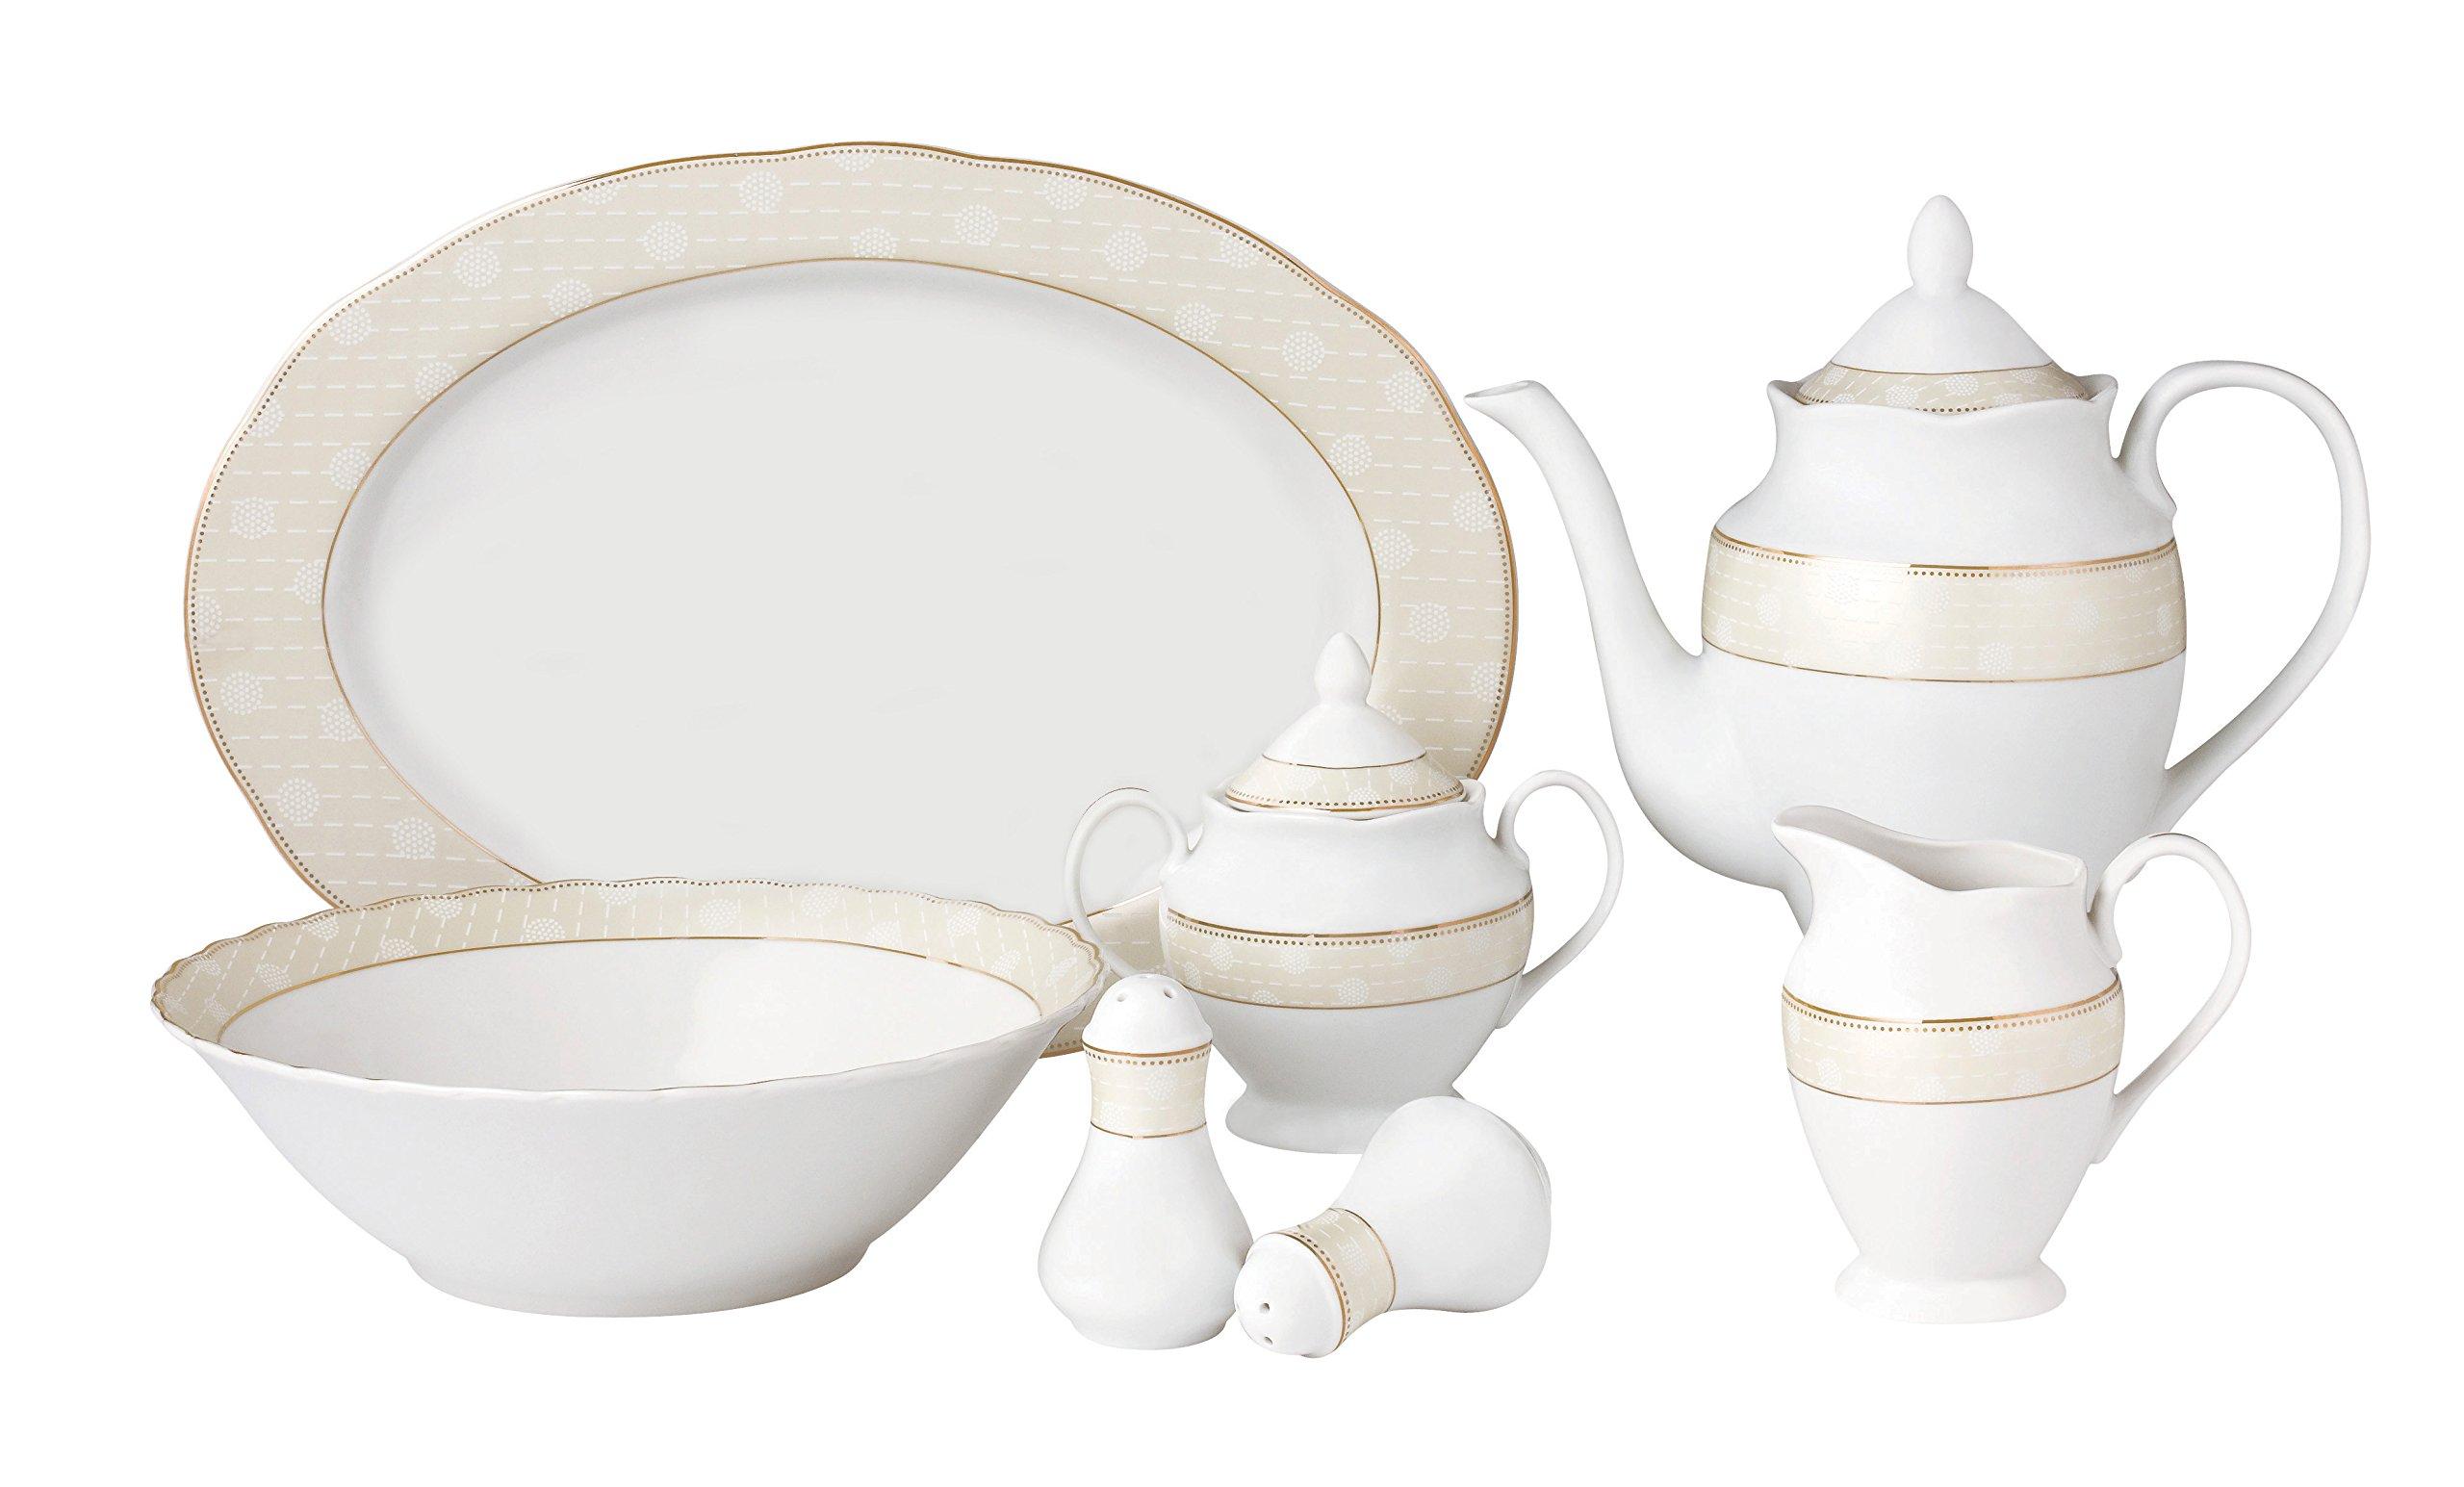 Lorren Home Trends Tova-57 57 Piece Wavy Porcelain Tova Collection Dinnerware Set, Gold